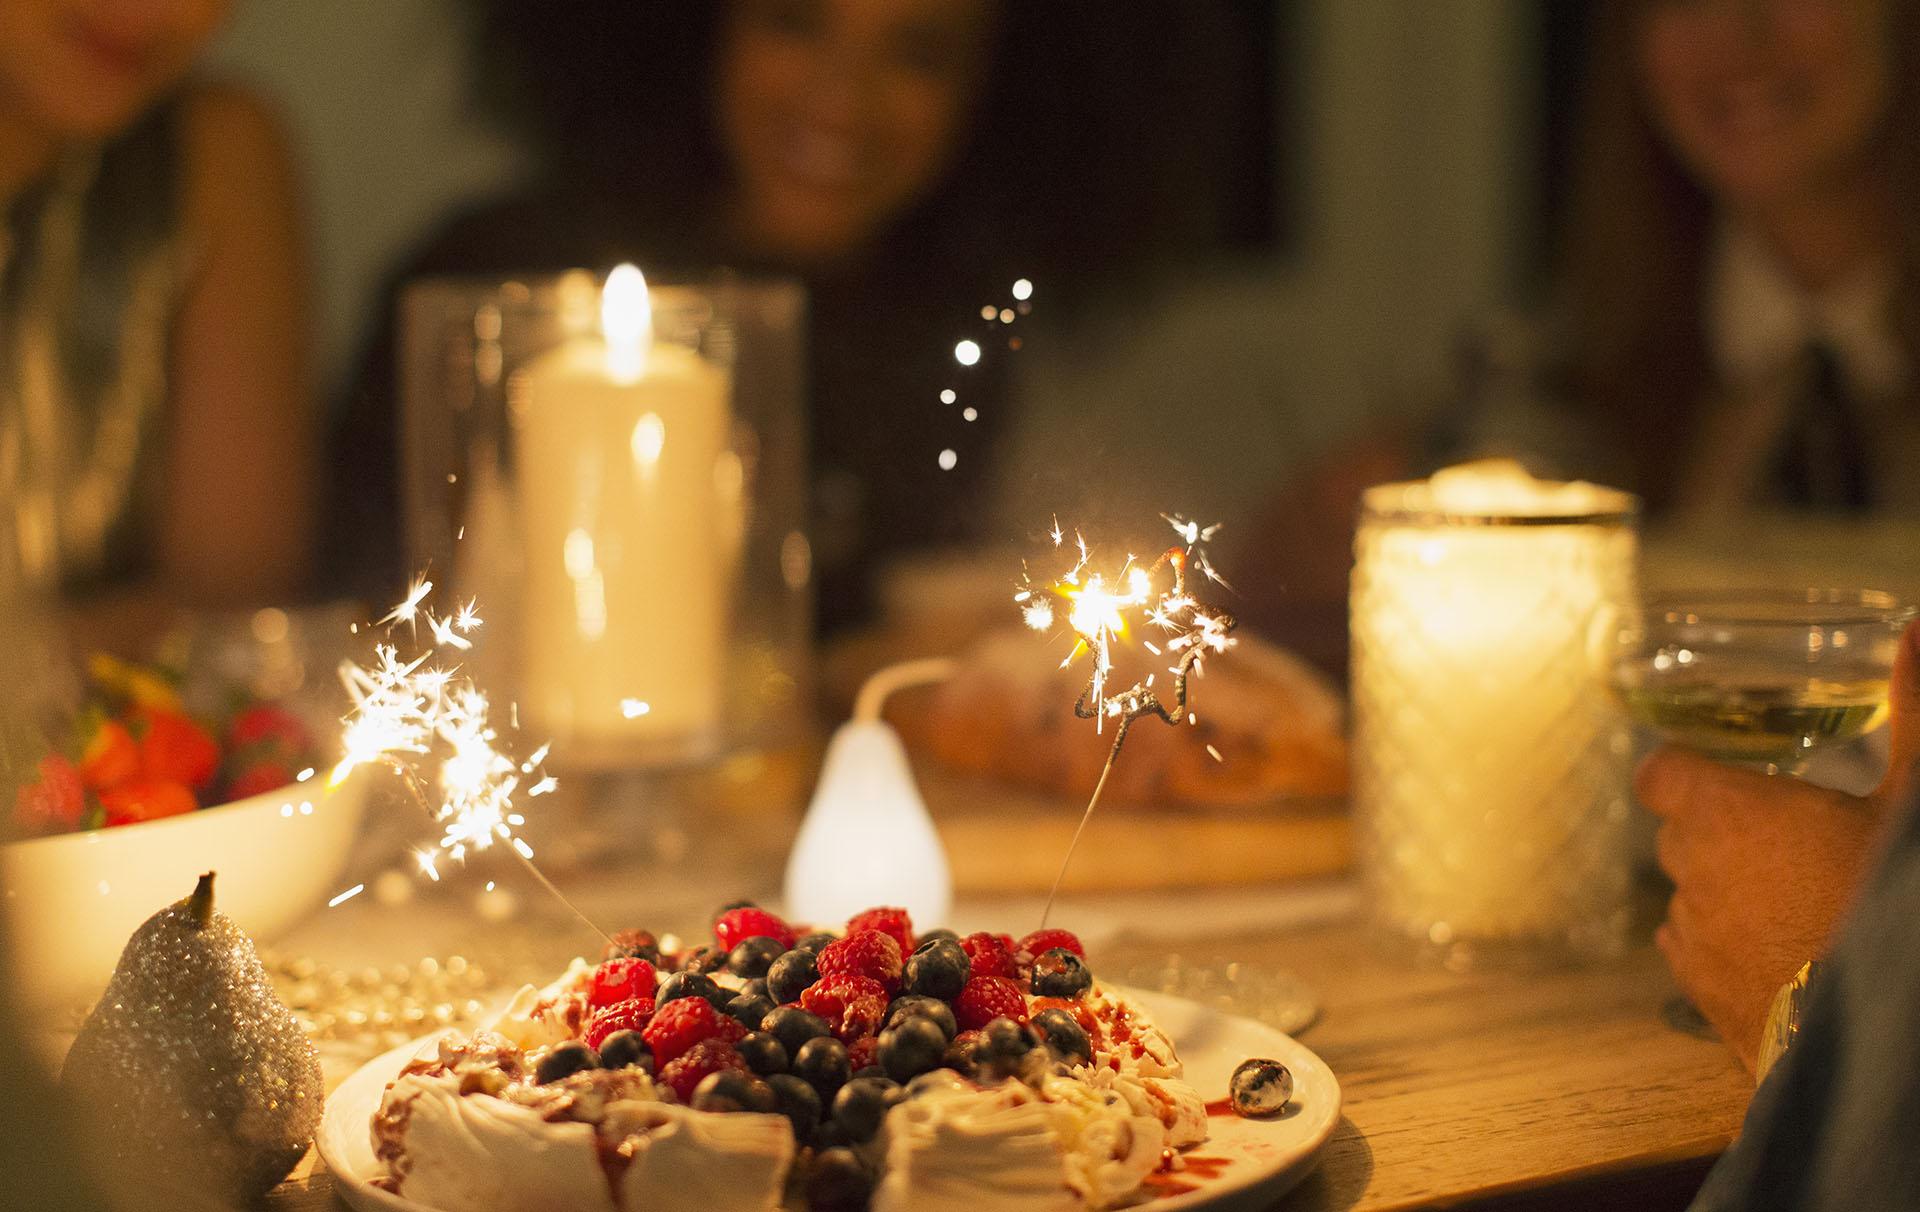 Asda's melt in the middle Christmas dessert